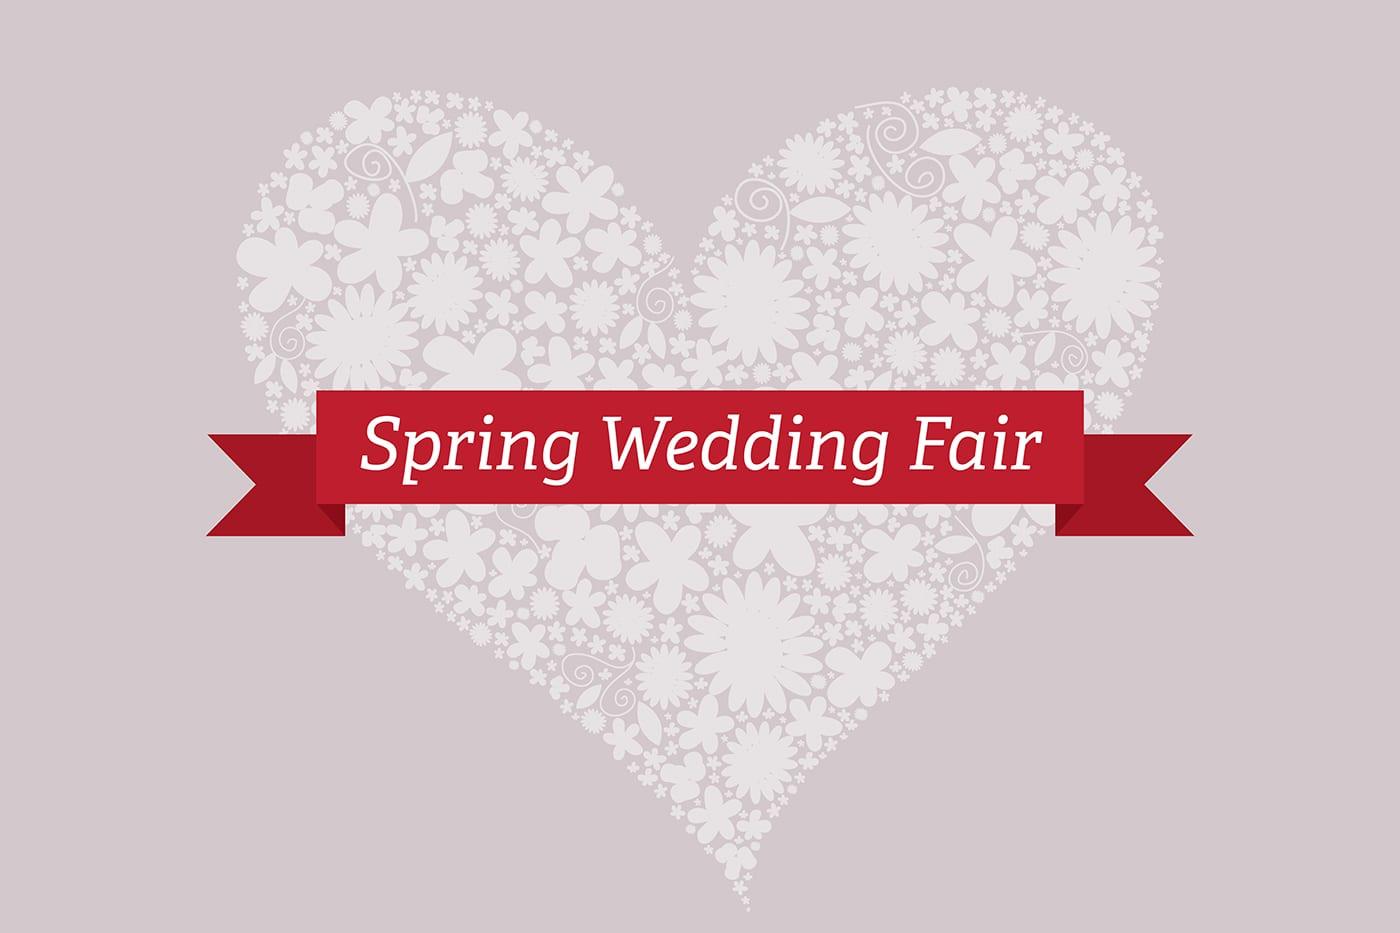 Spring Wedding Fair